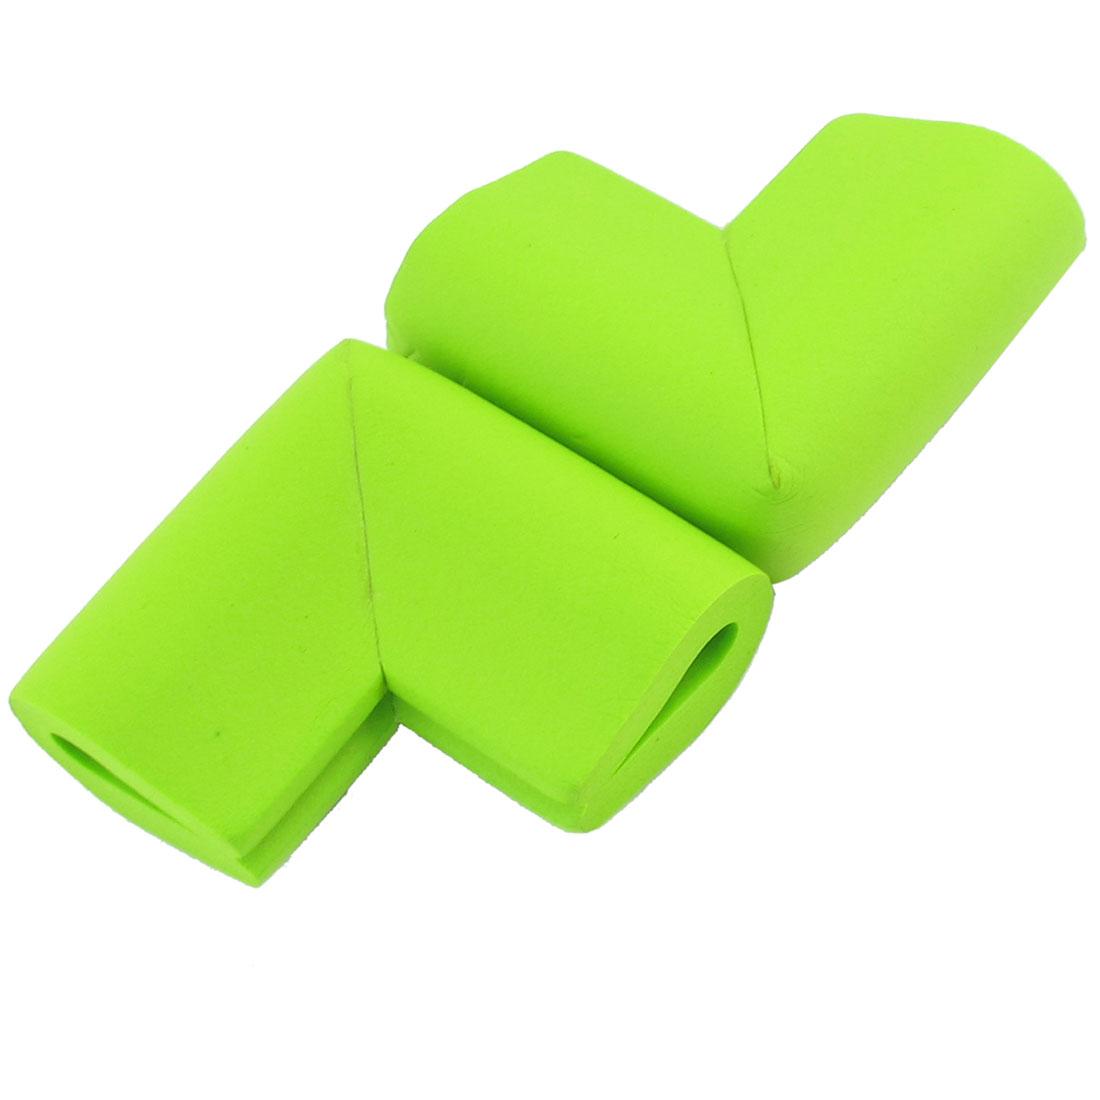 Table Worktop Corner Pad Mat Cover Safty Protector Guard Cushion Green 2 Pcs